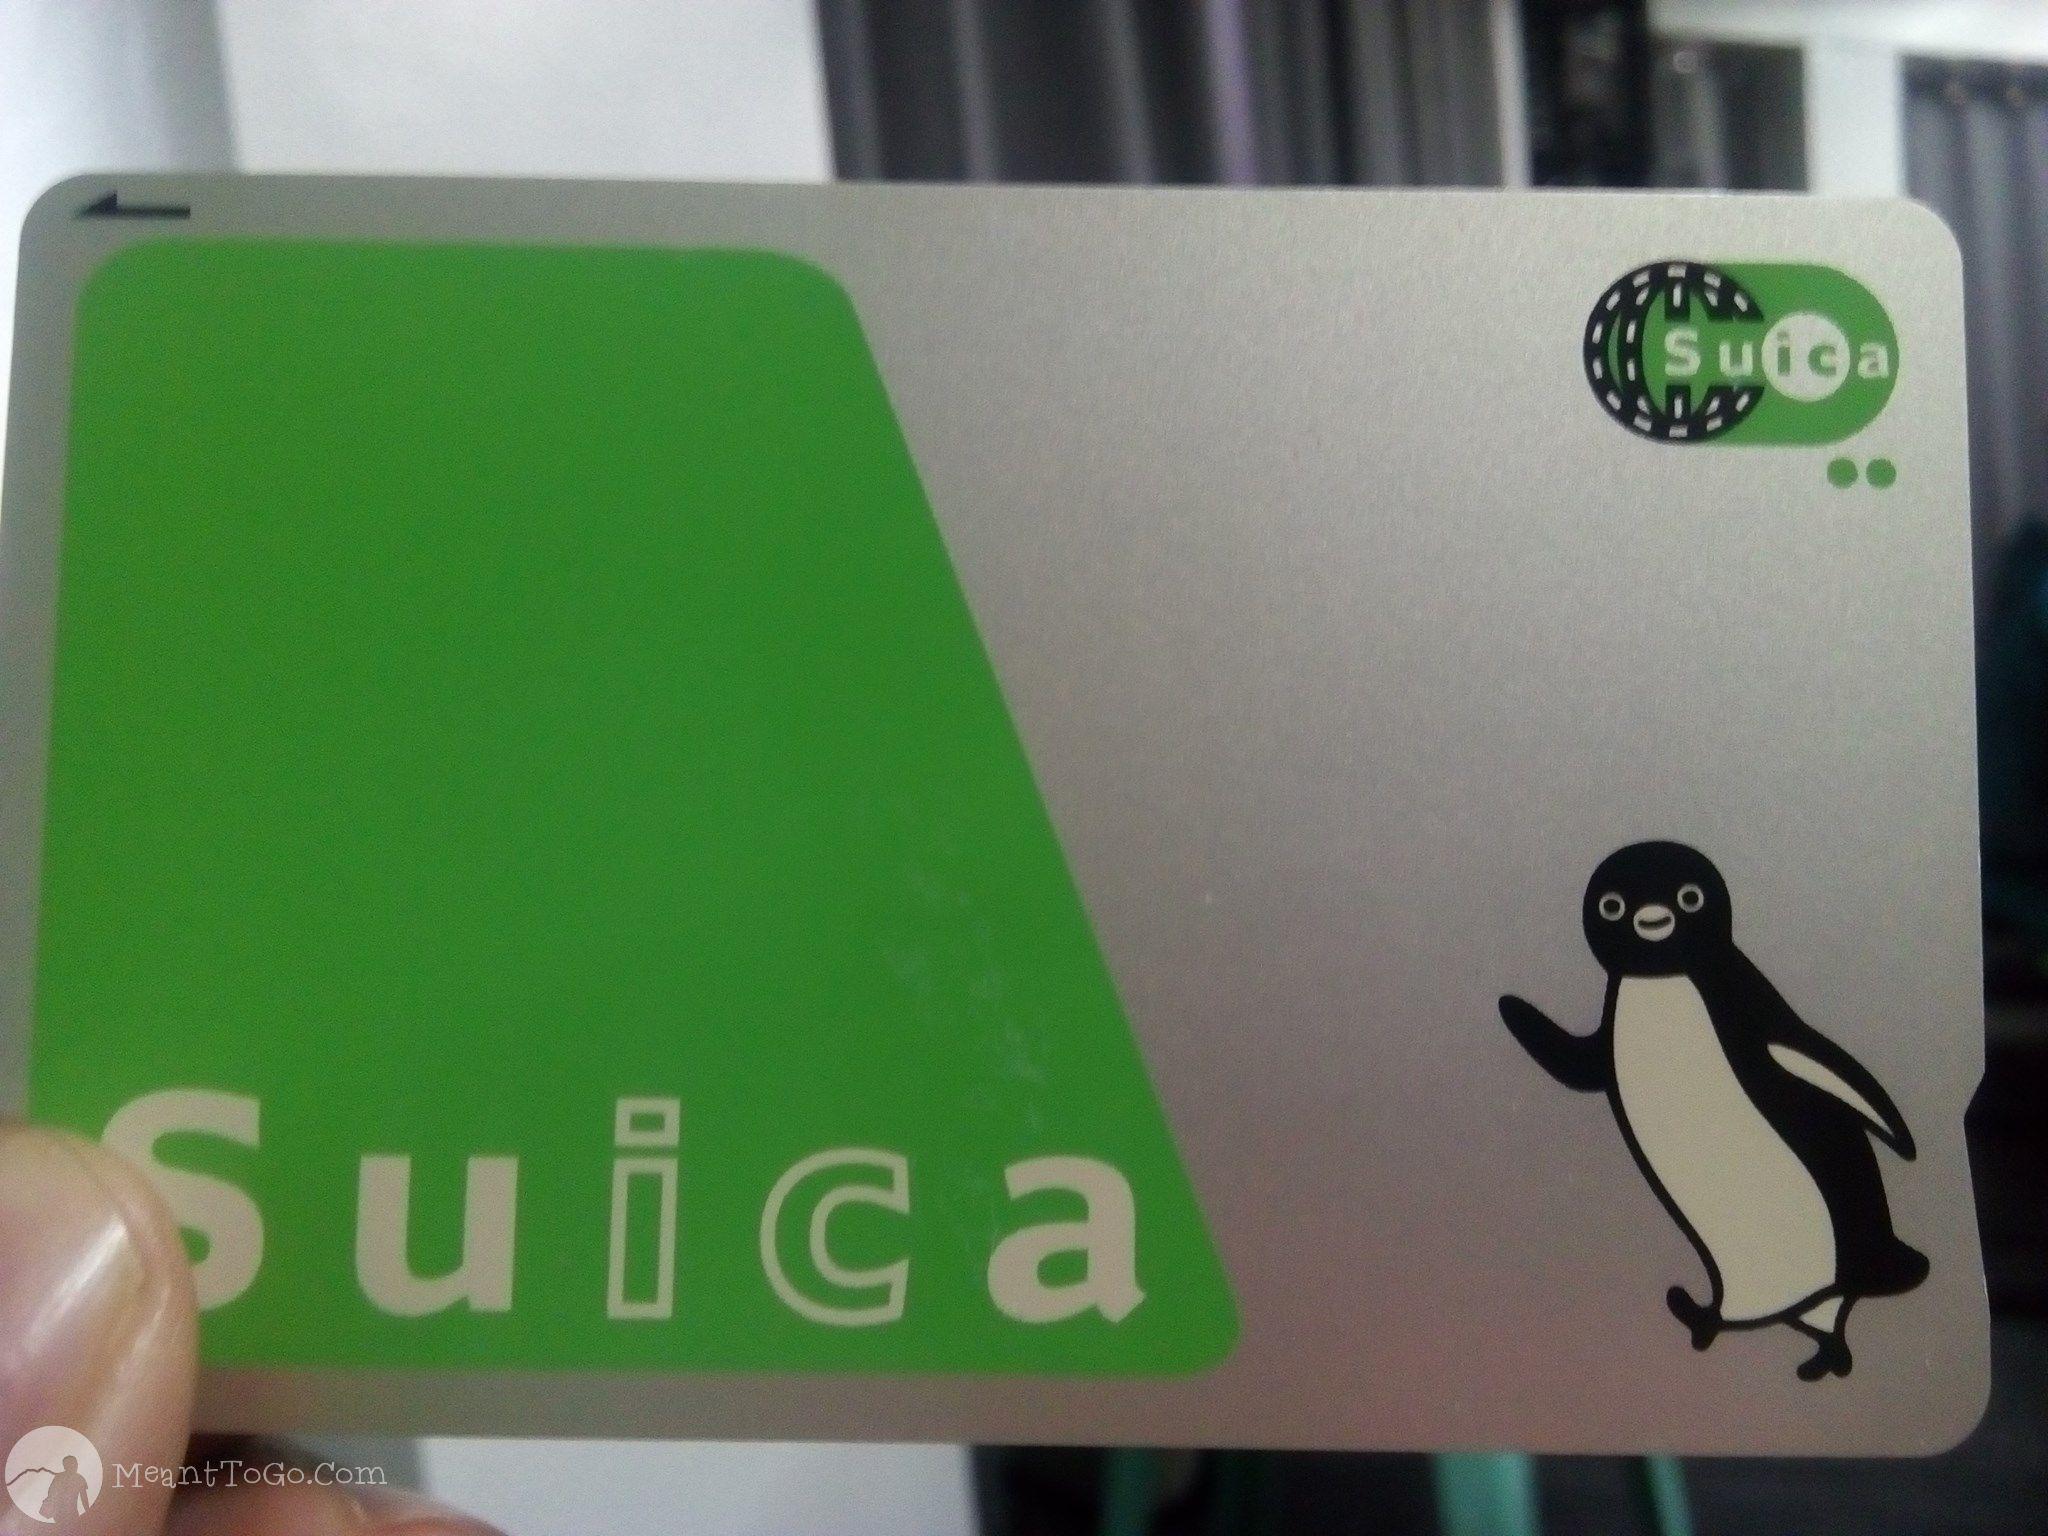 Suica - Japan prepaid card